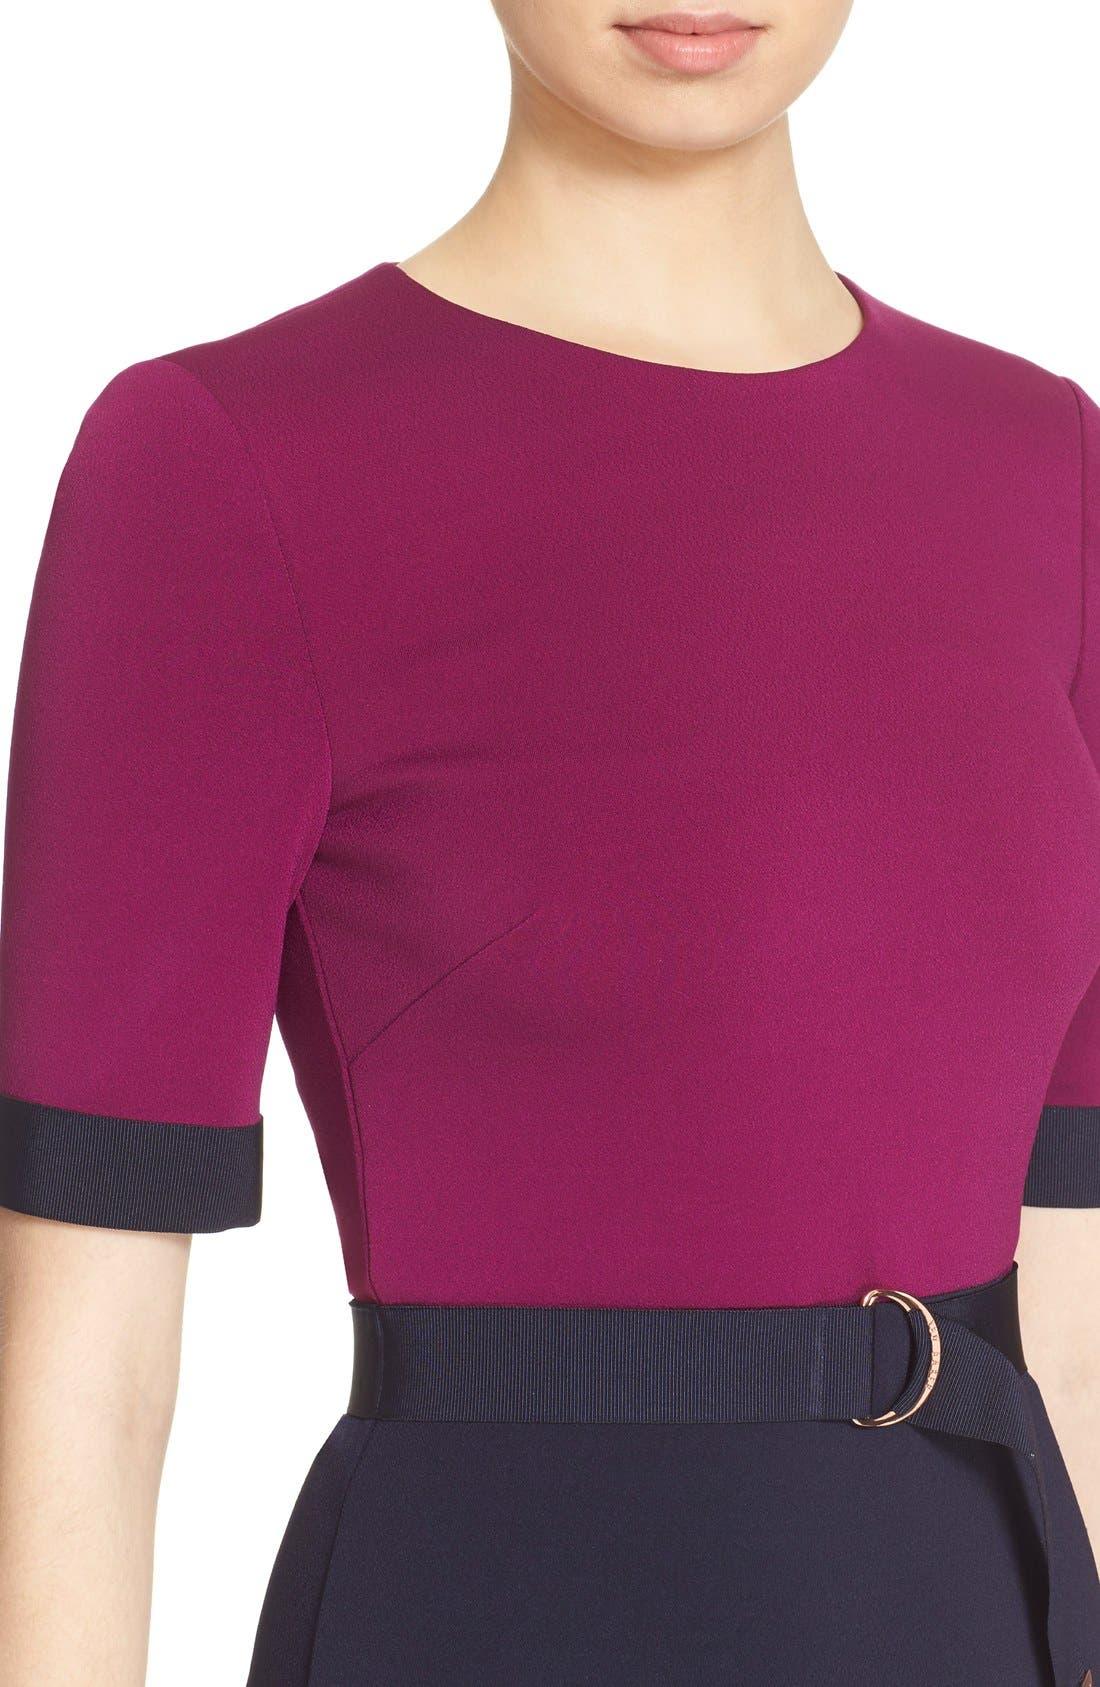 Alternate Image 4  - Ted Baker London 'Wandee' Colorblock D-Ring Sheath Dress